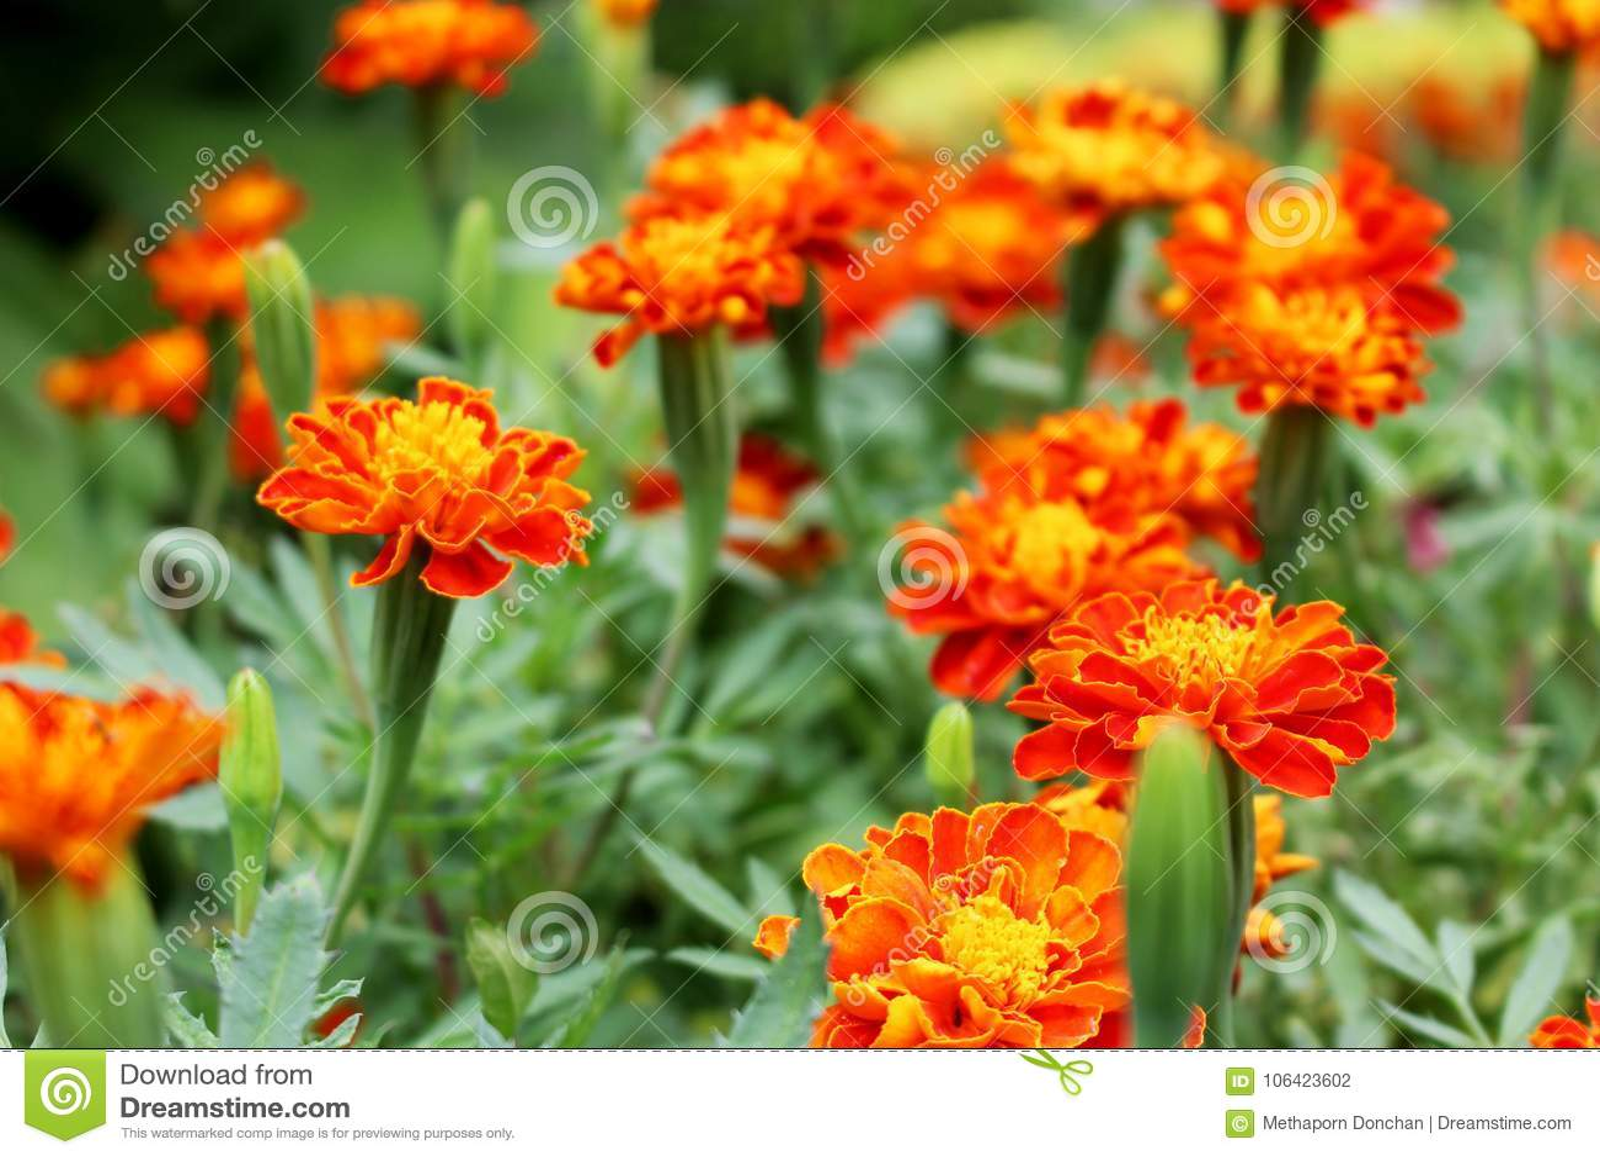 Selective focus beautiful orange and yellow colors of marigold download selective focus beautiful orange and yellow colors of marigold flowers on flowers background stock photo mightylinksfo